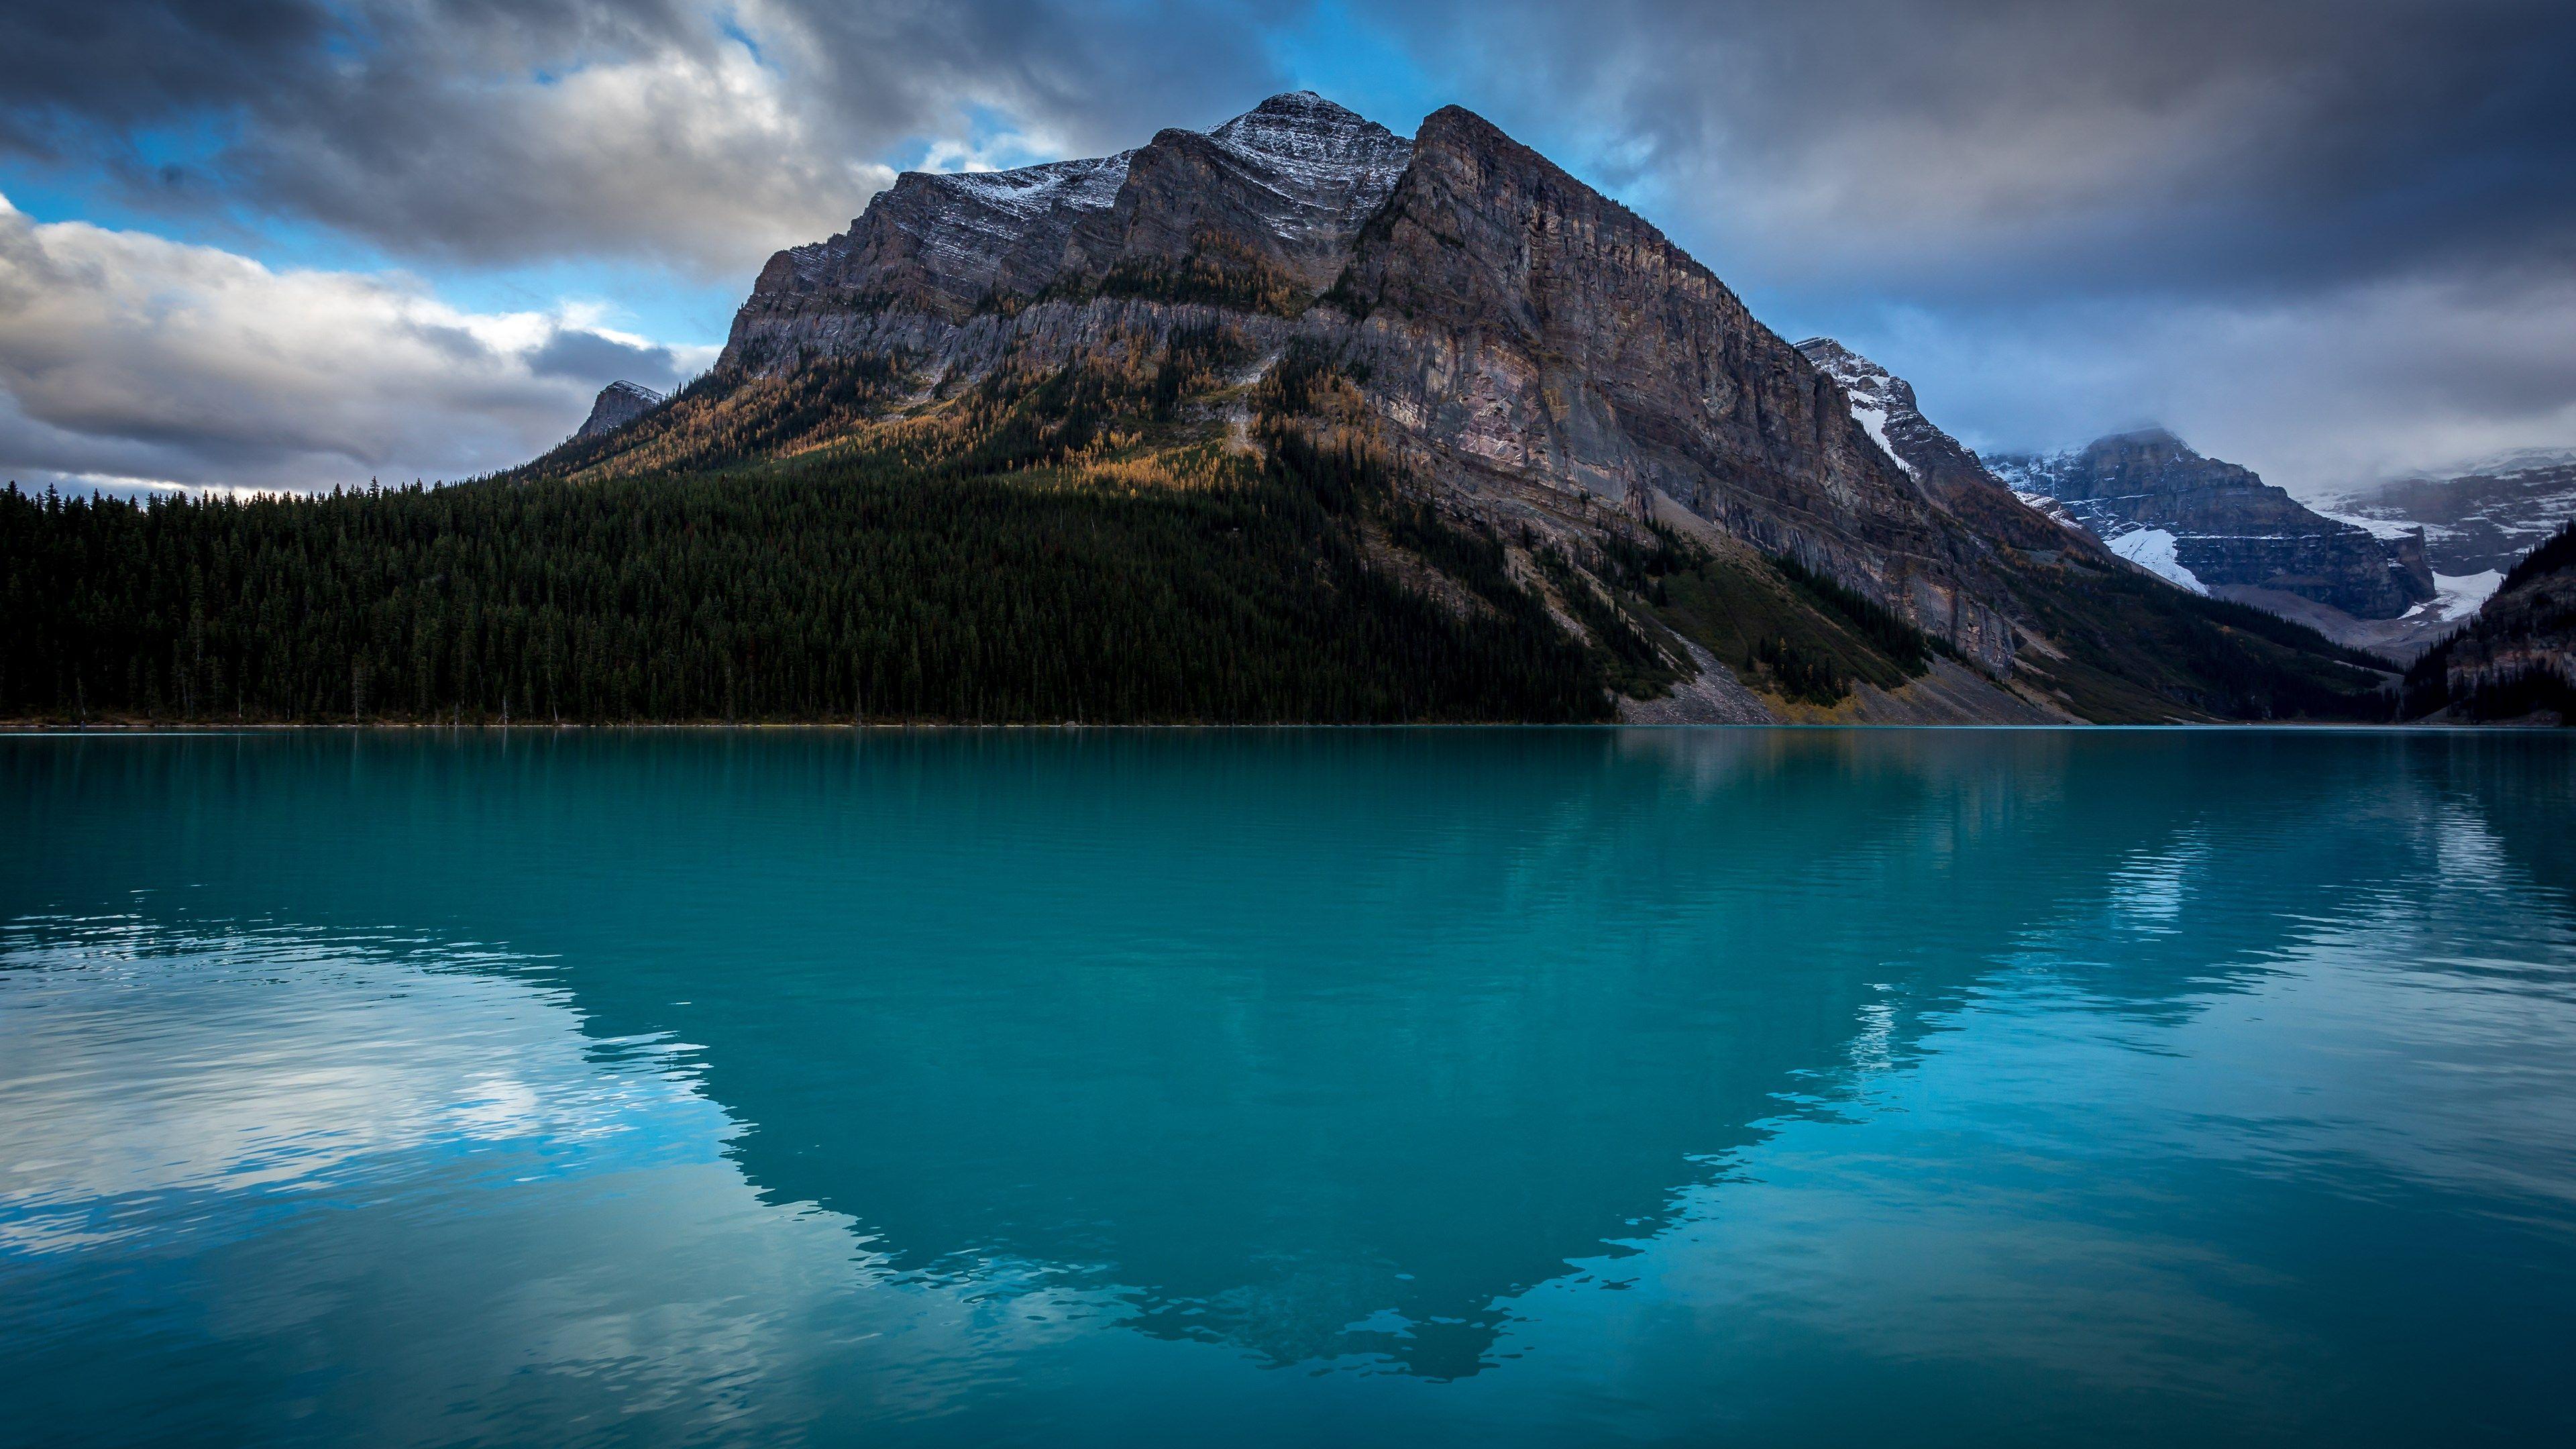 Wallpaper Collection 37 Best Free Hd 4k Wallpaper Desktop Background To Download Pc Mobi In 2020 Banff National Park Lake Louise 4k Background